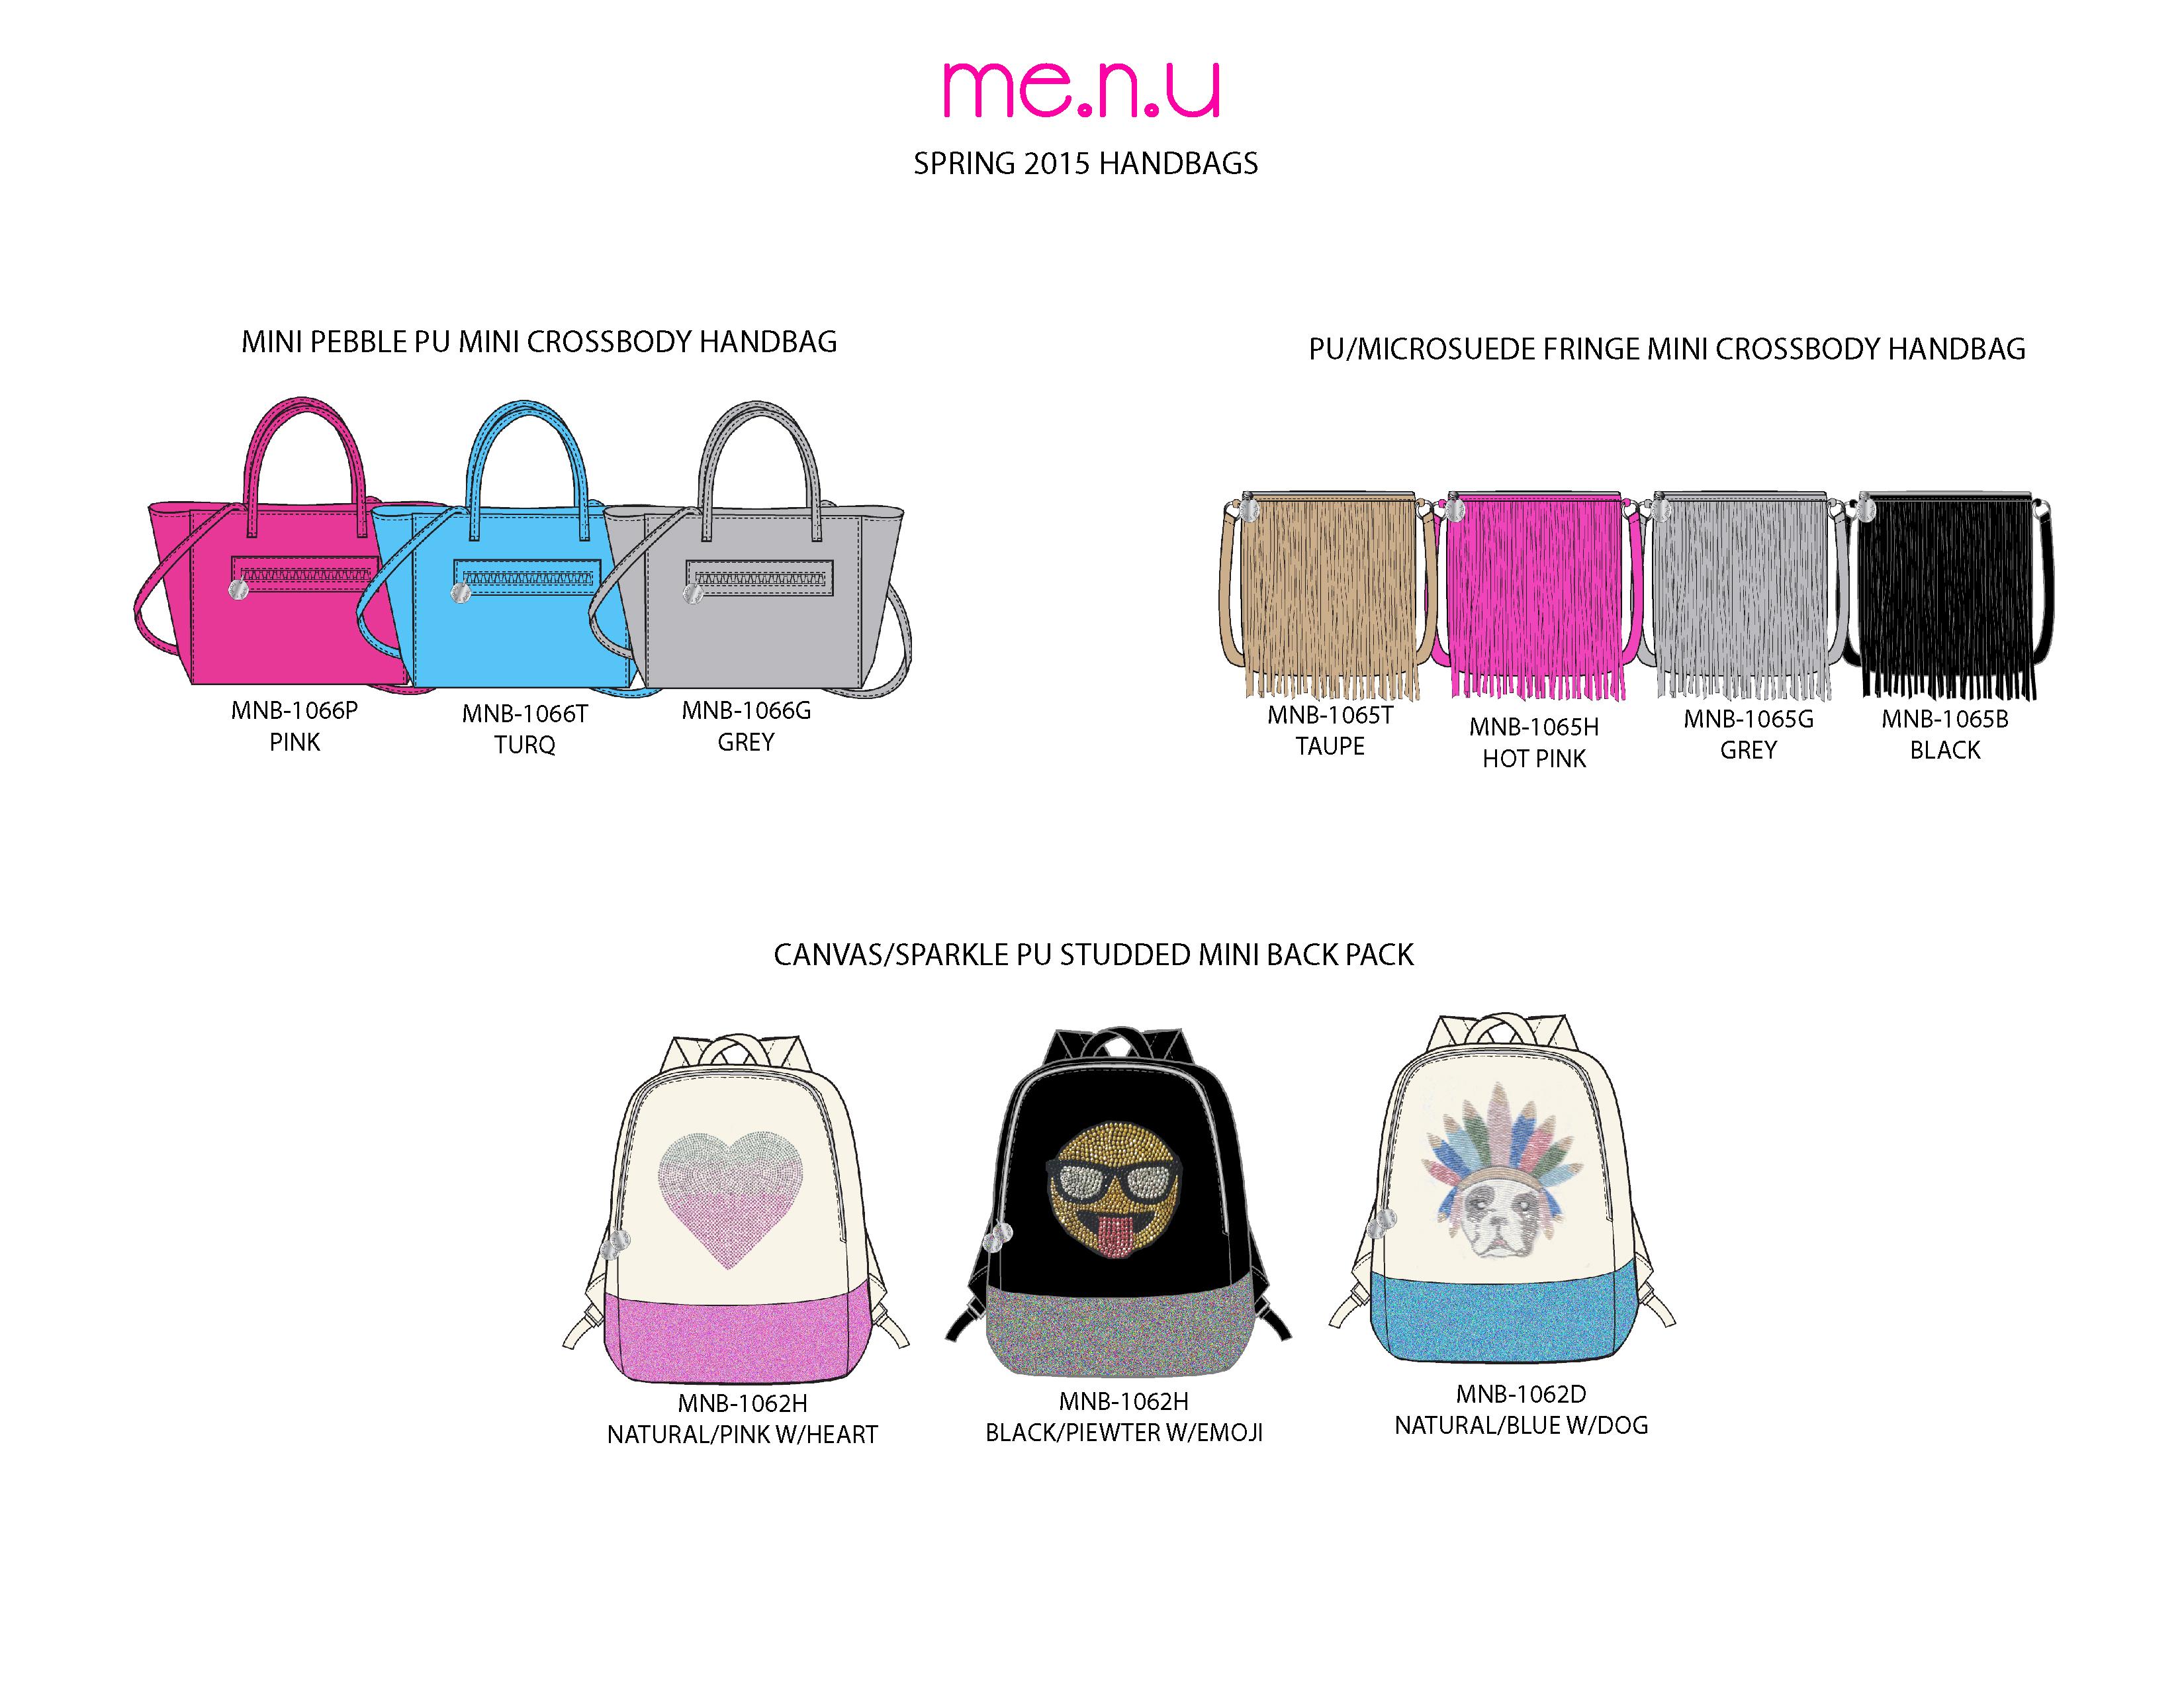 Me.n.u Spr '15 Handbags